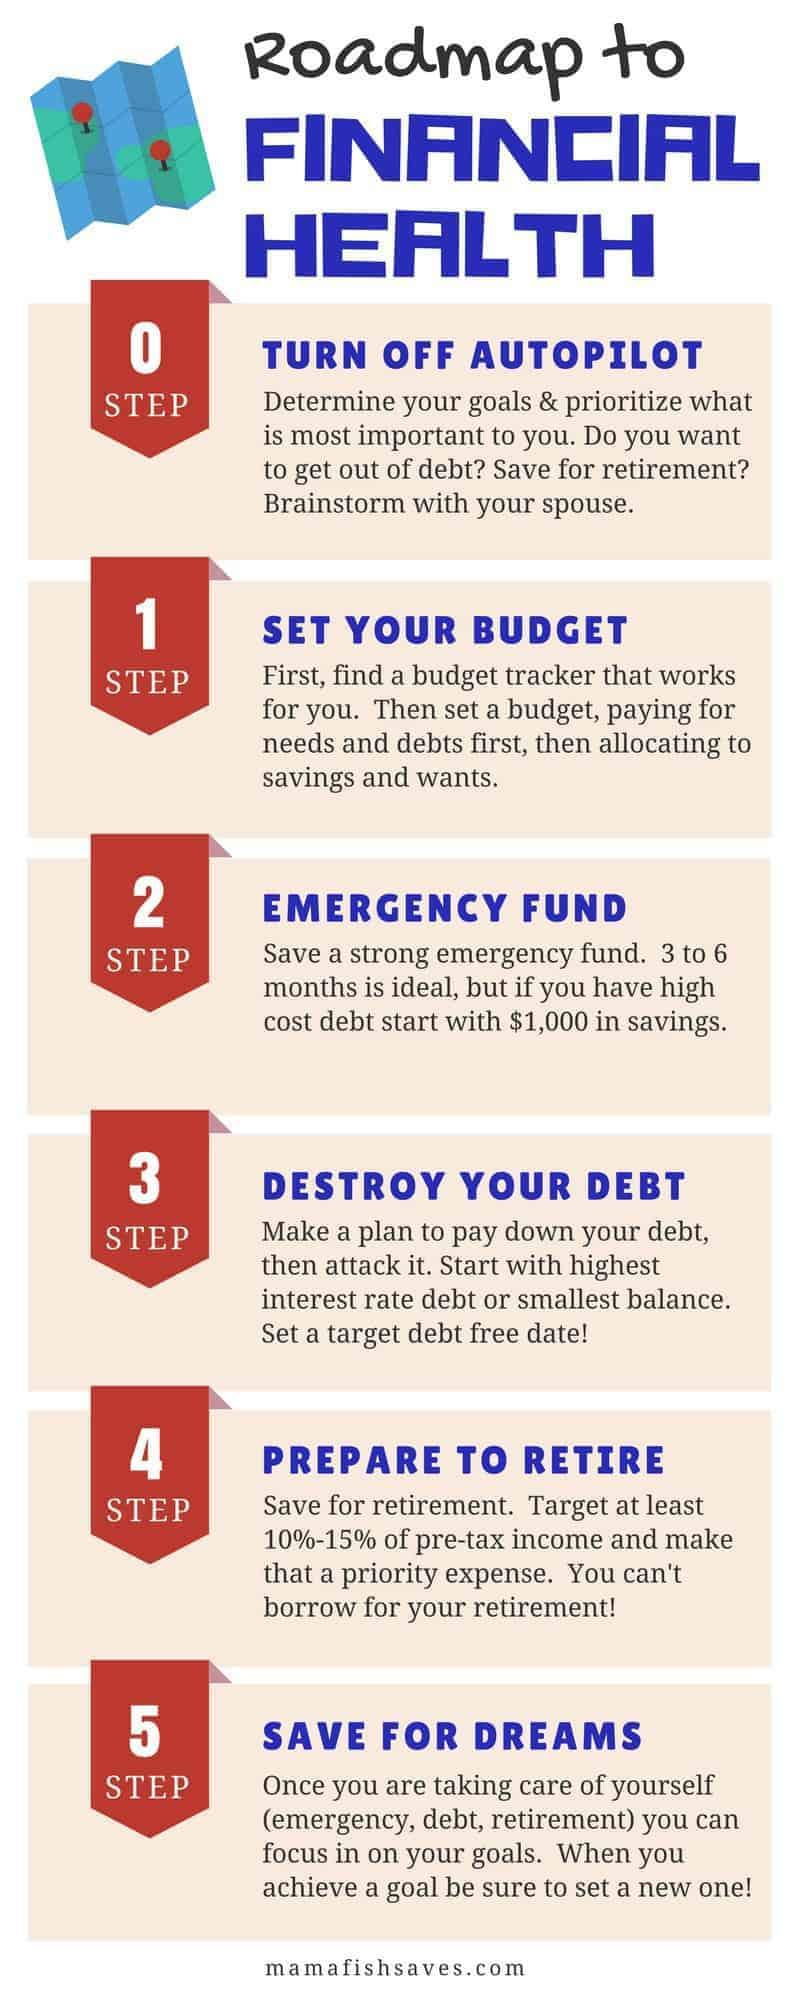 roadmap_financial_health_infographic